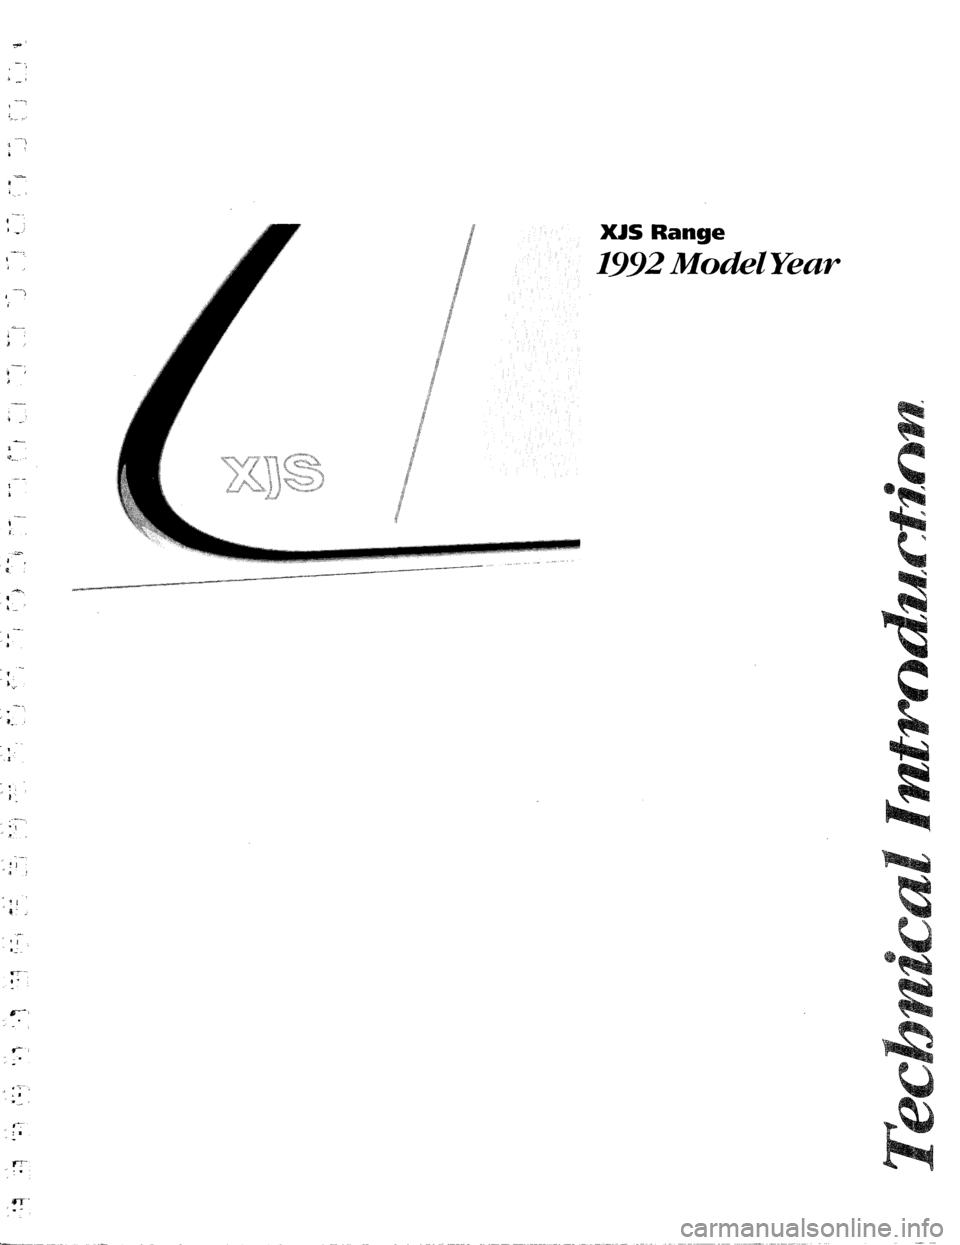 JAGUAR XJS 1992 1.G Technical Information Manual